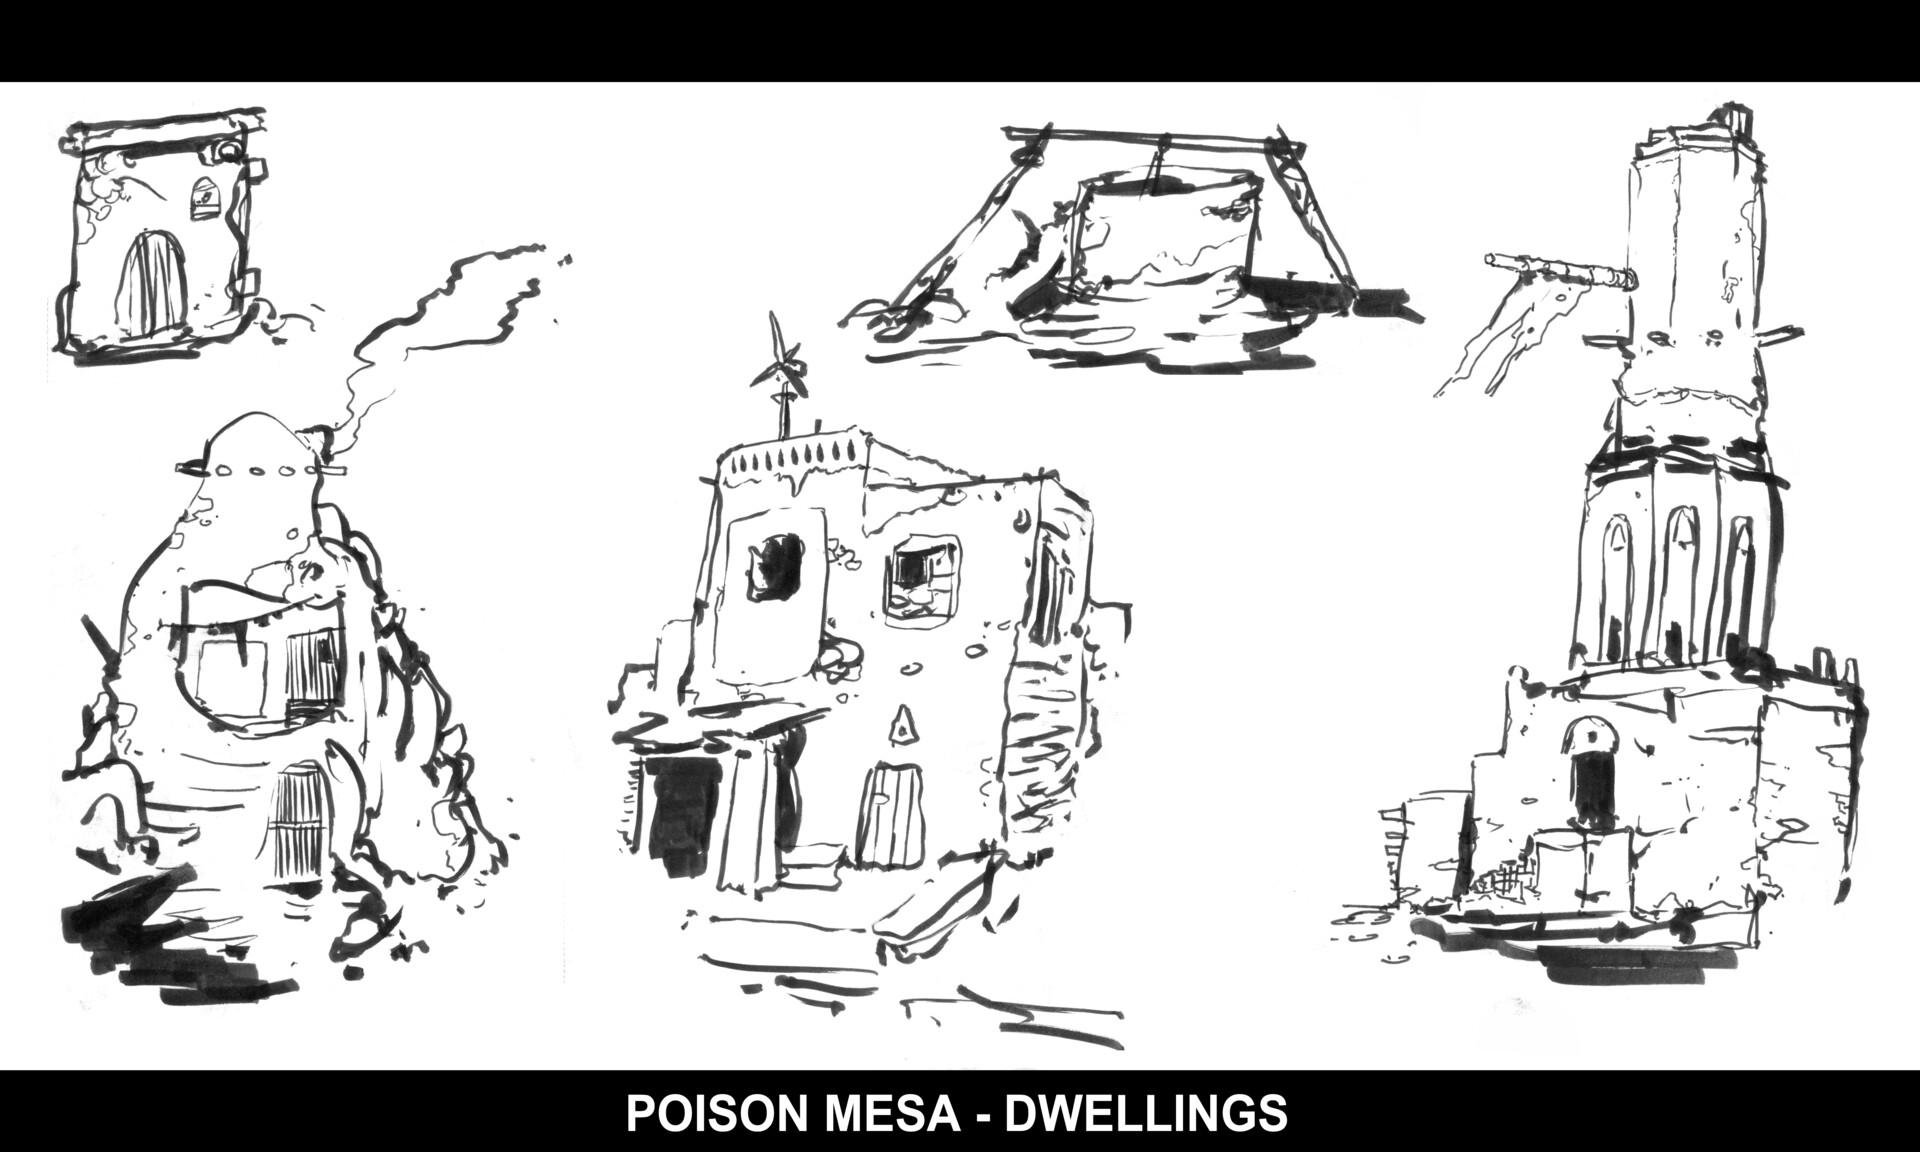 Christian herman pm dwelling sketches 01